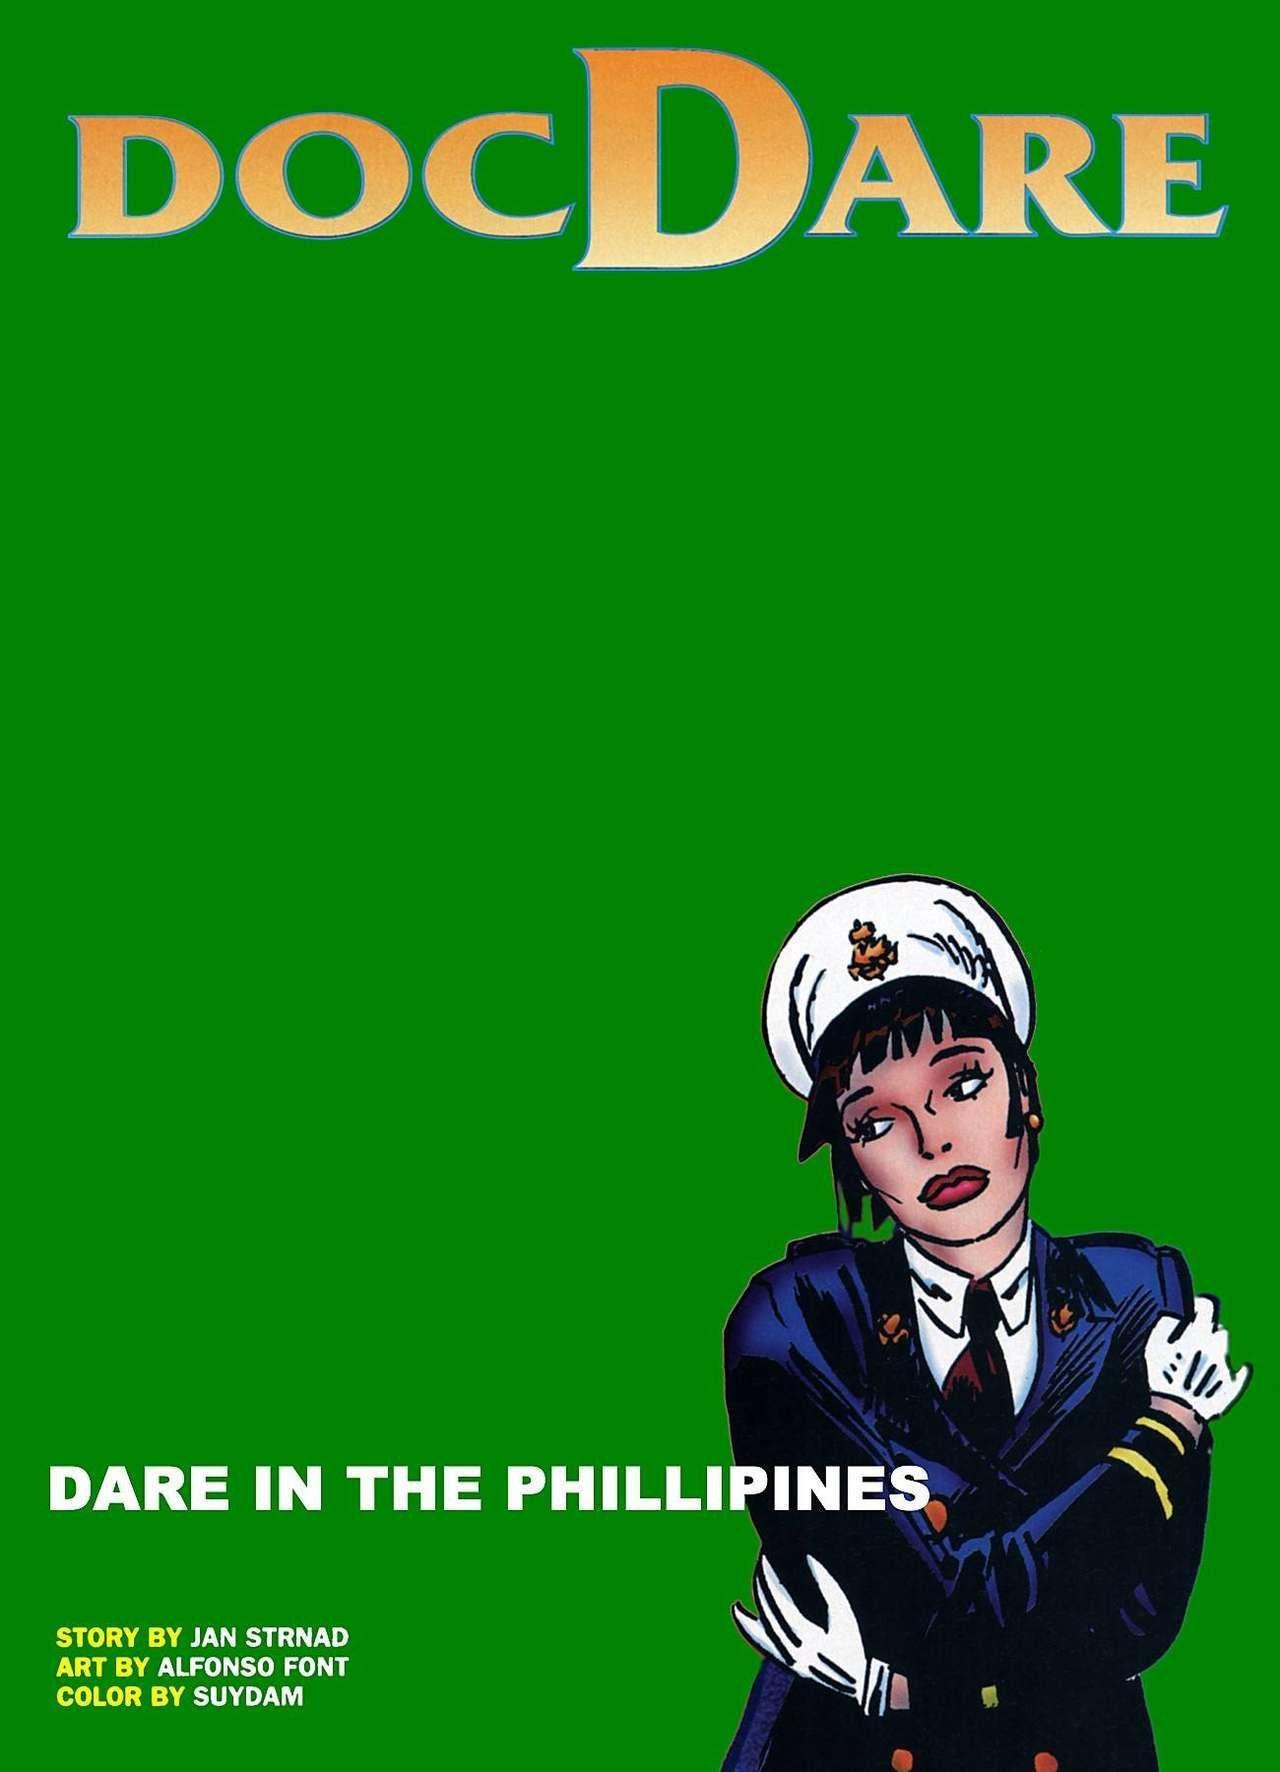 Alfonso Font Doctor Dare - Dare in Phillipines